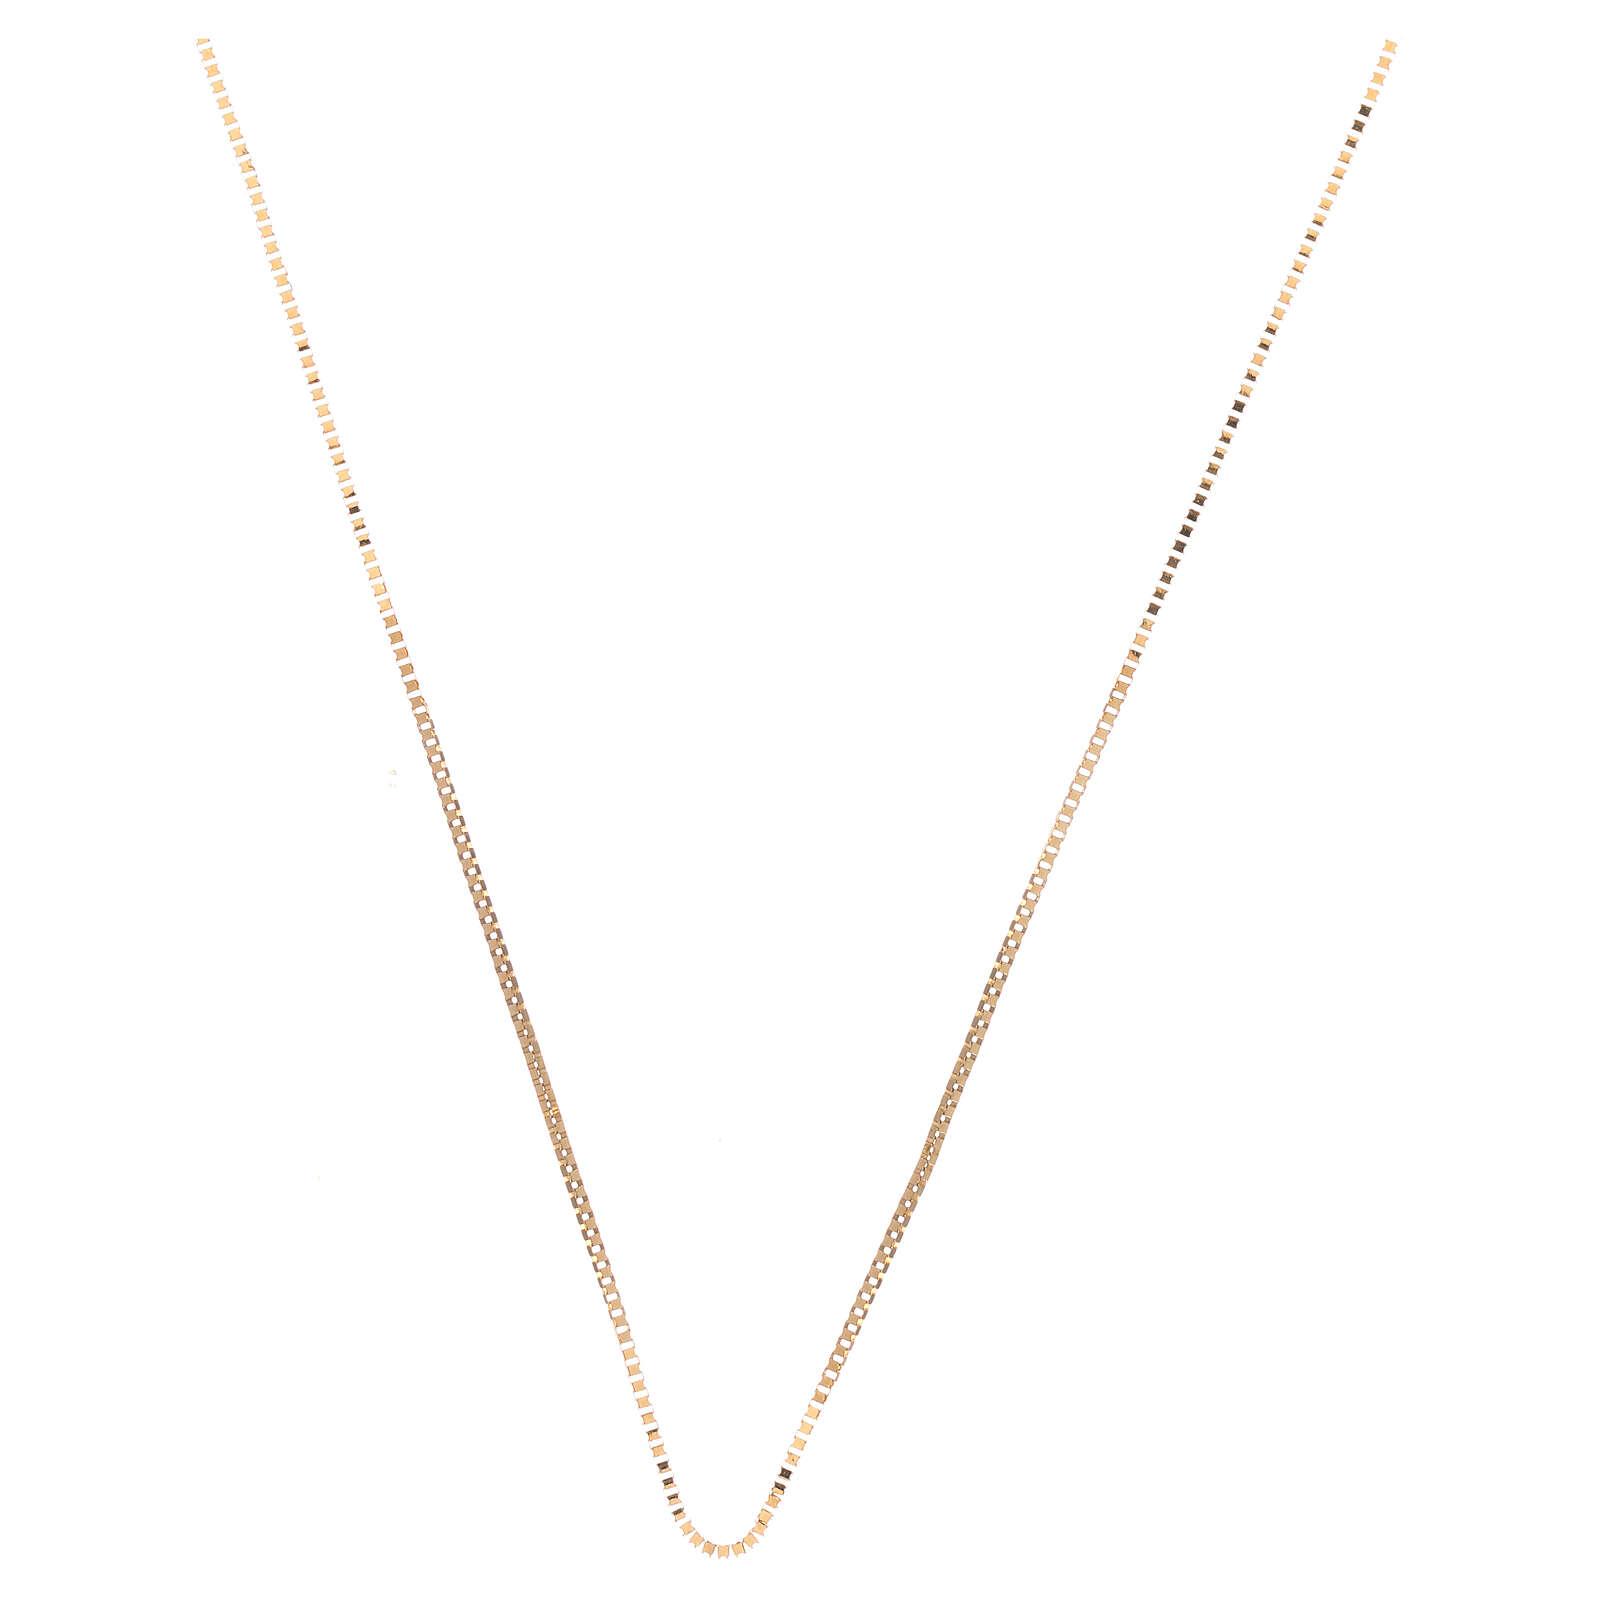 Box chain 18-carat yellow gold 16 1/2 in 4